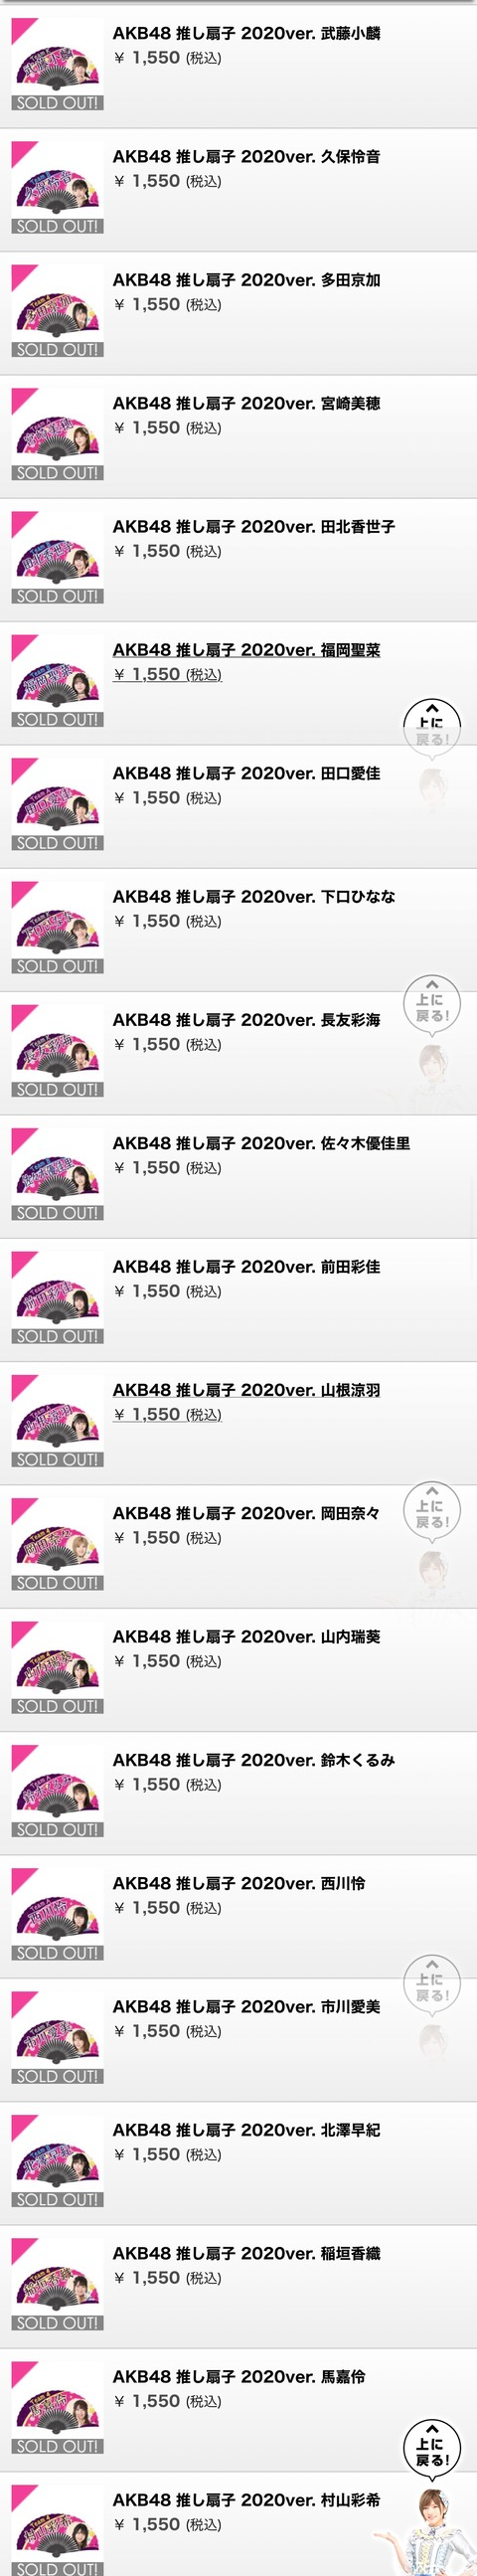 【AKB48】推し扇子2020、完売メンバーと非完売メンバー